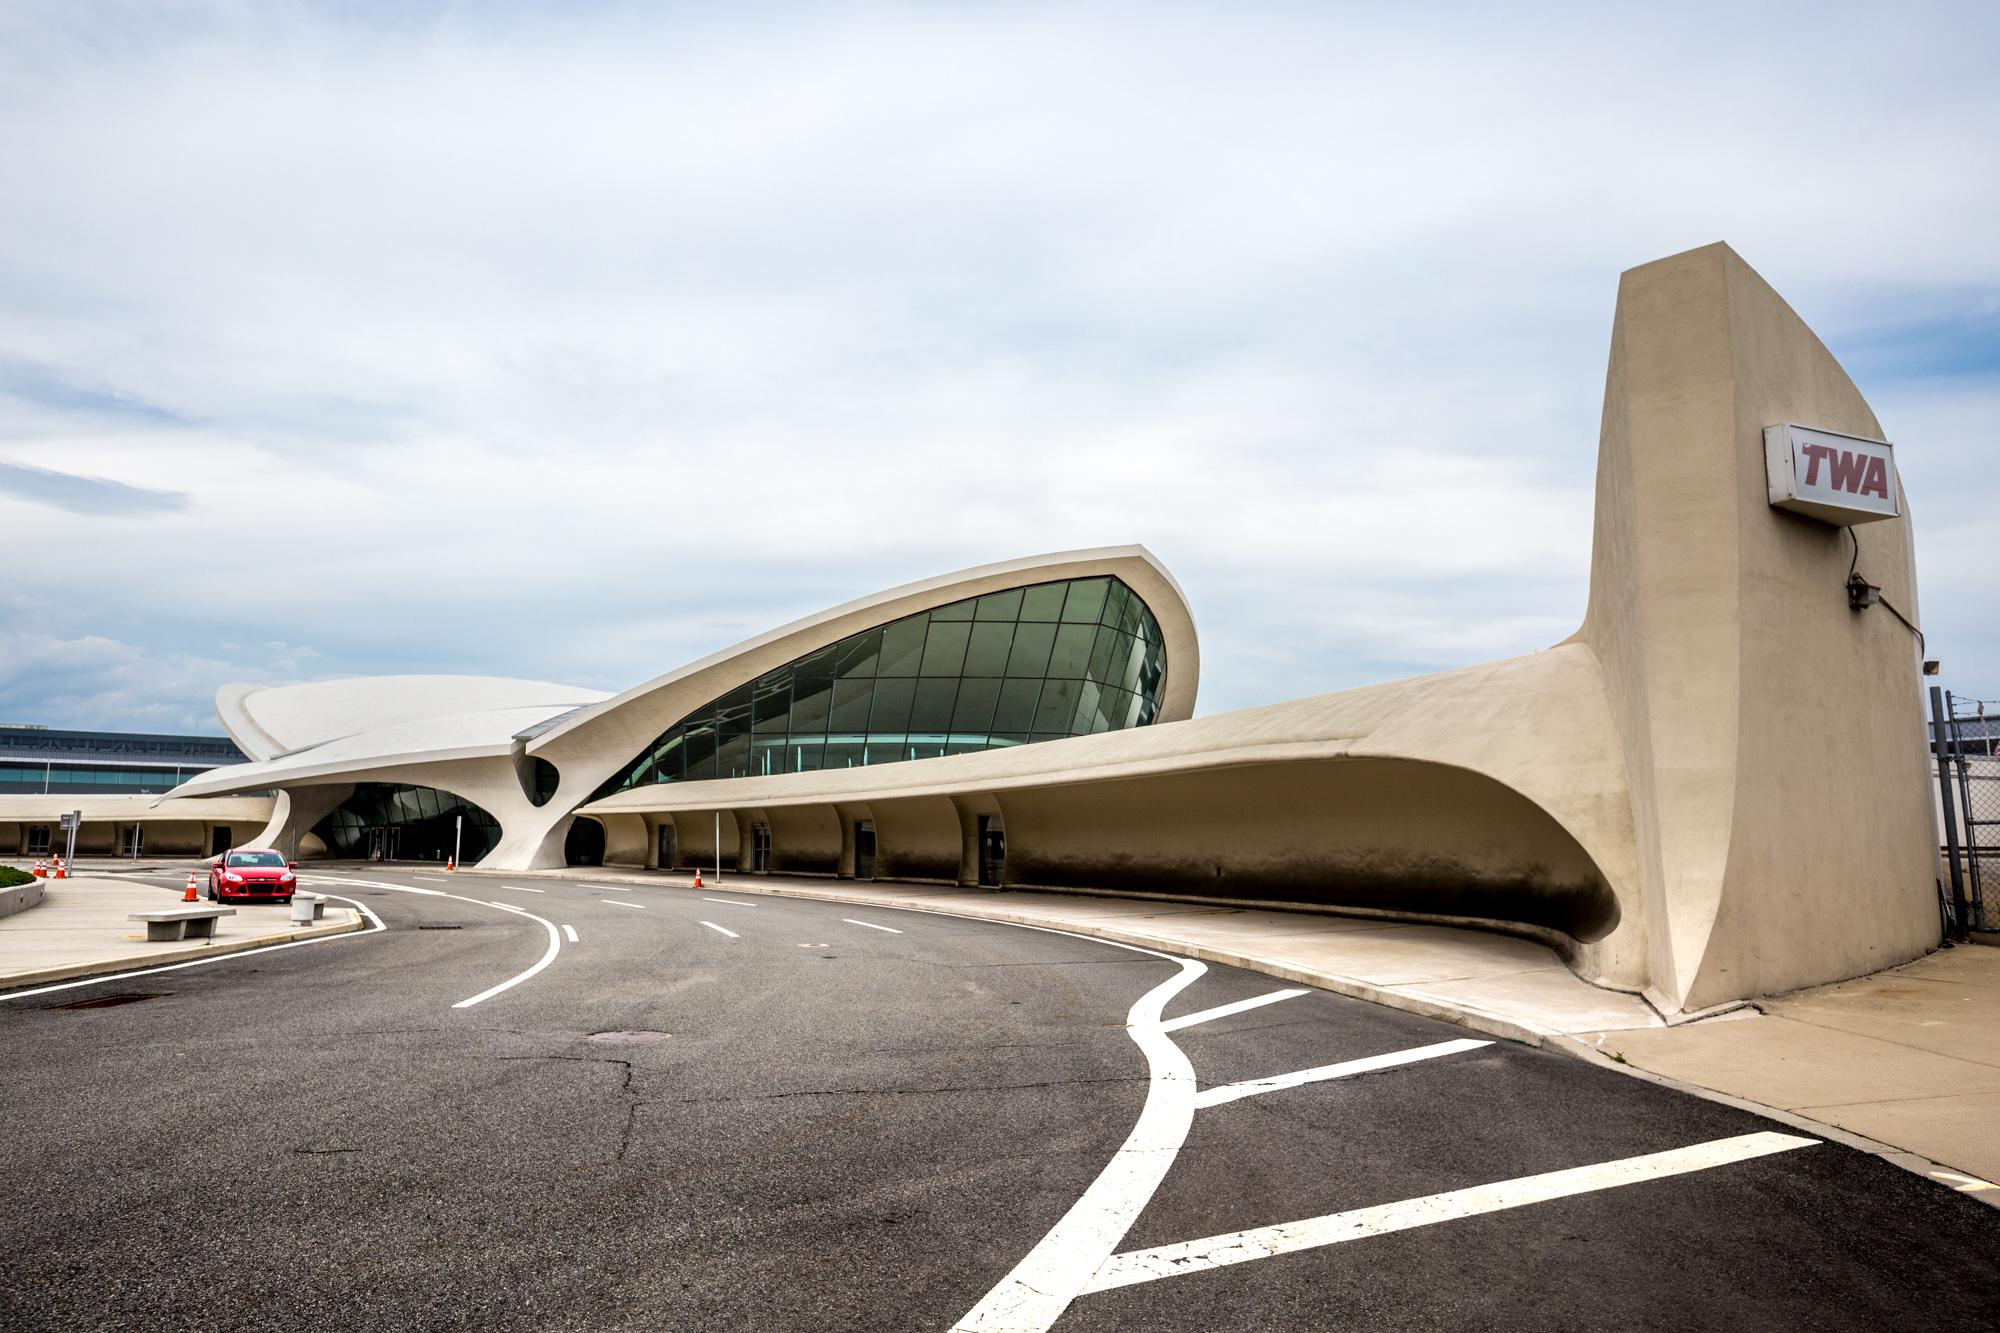 twa terminal hotel celebrates groundbreaking with a new rendering